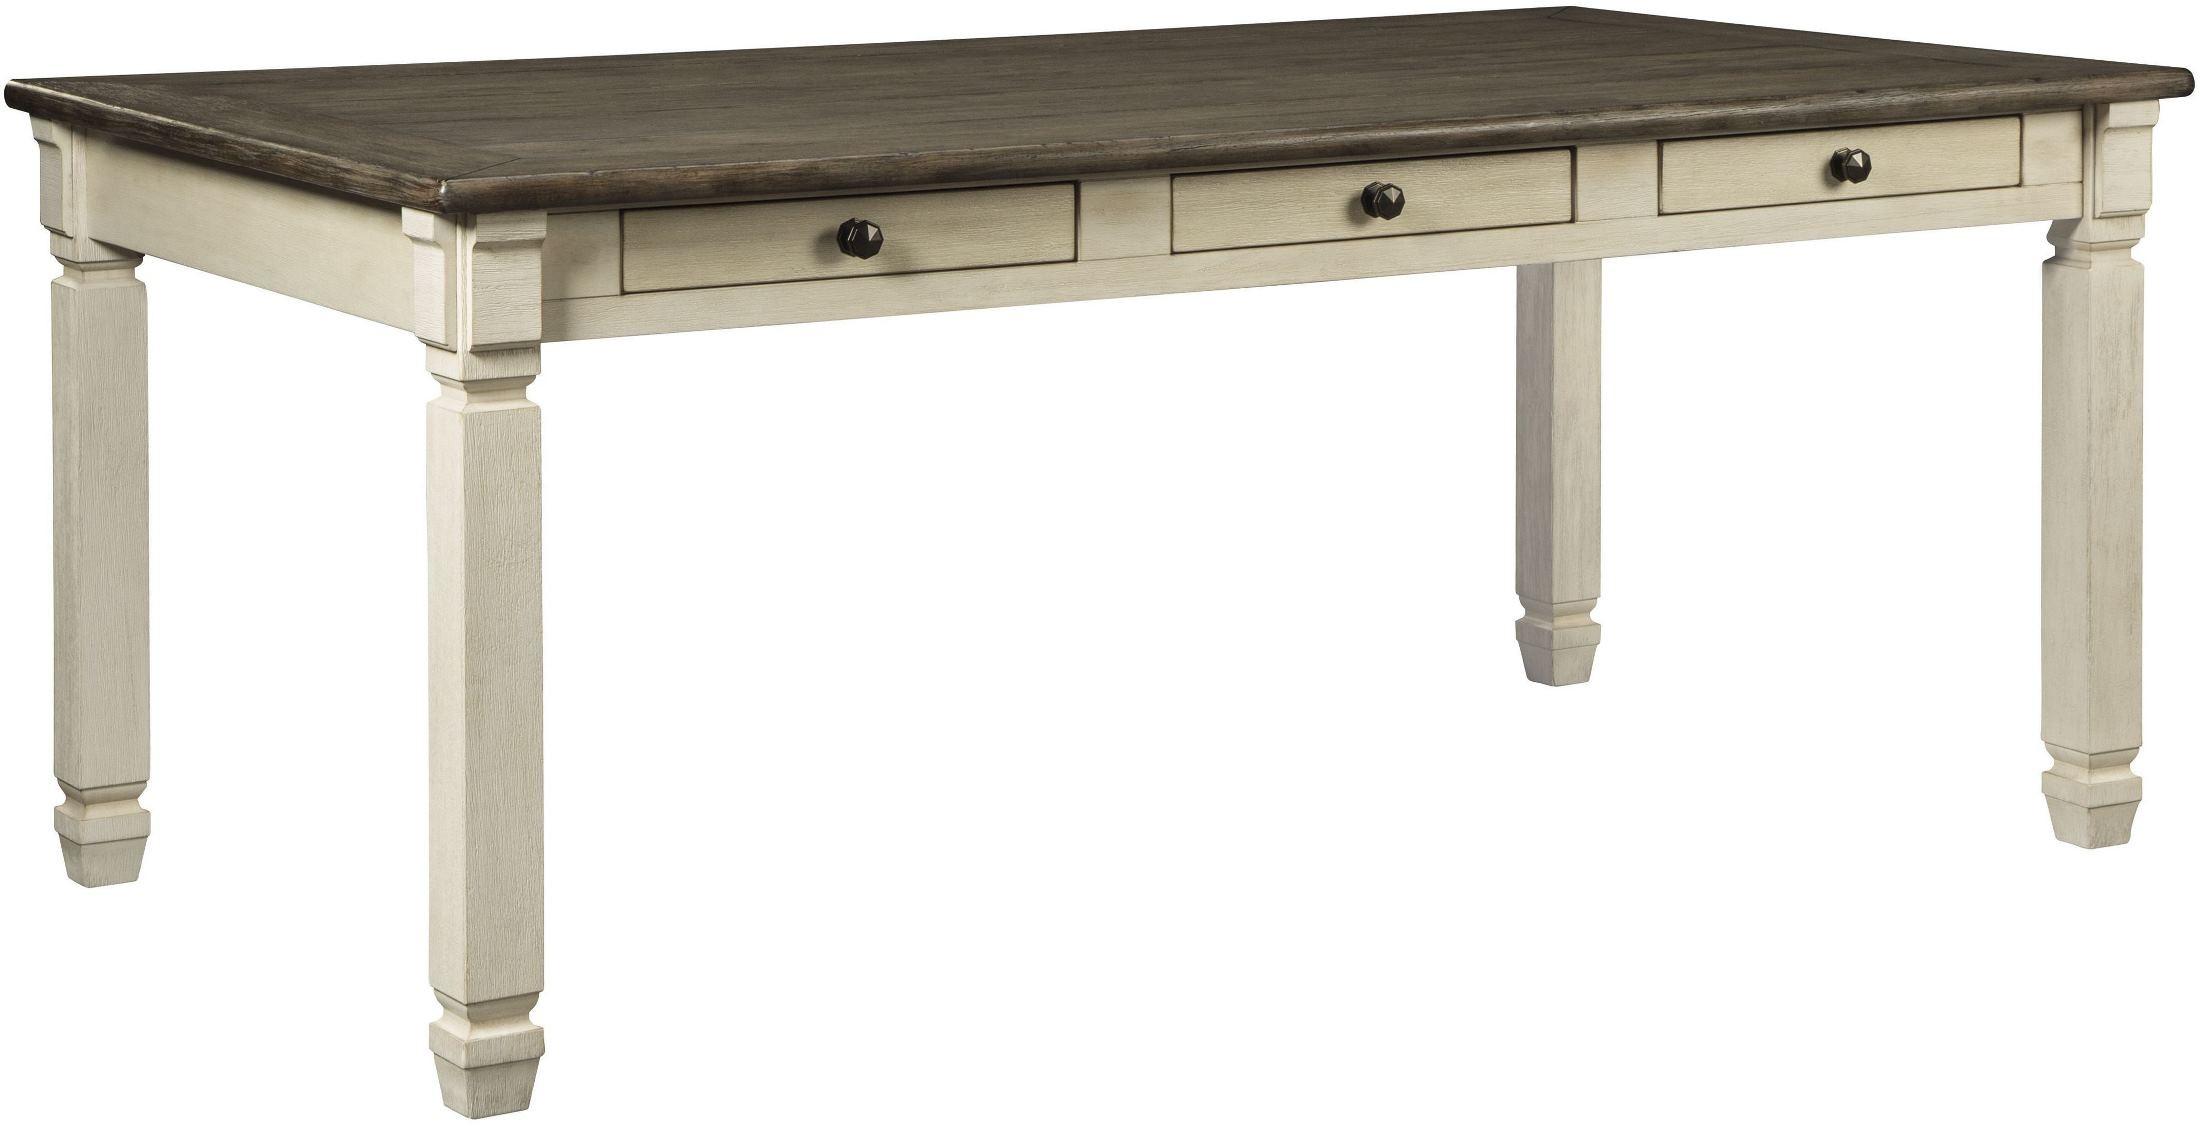 Bolanburg White And Gray Rectangular Dining Table D647 25